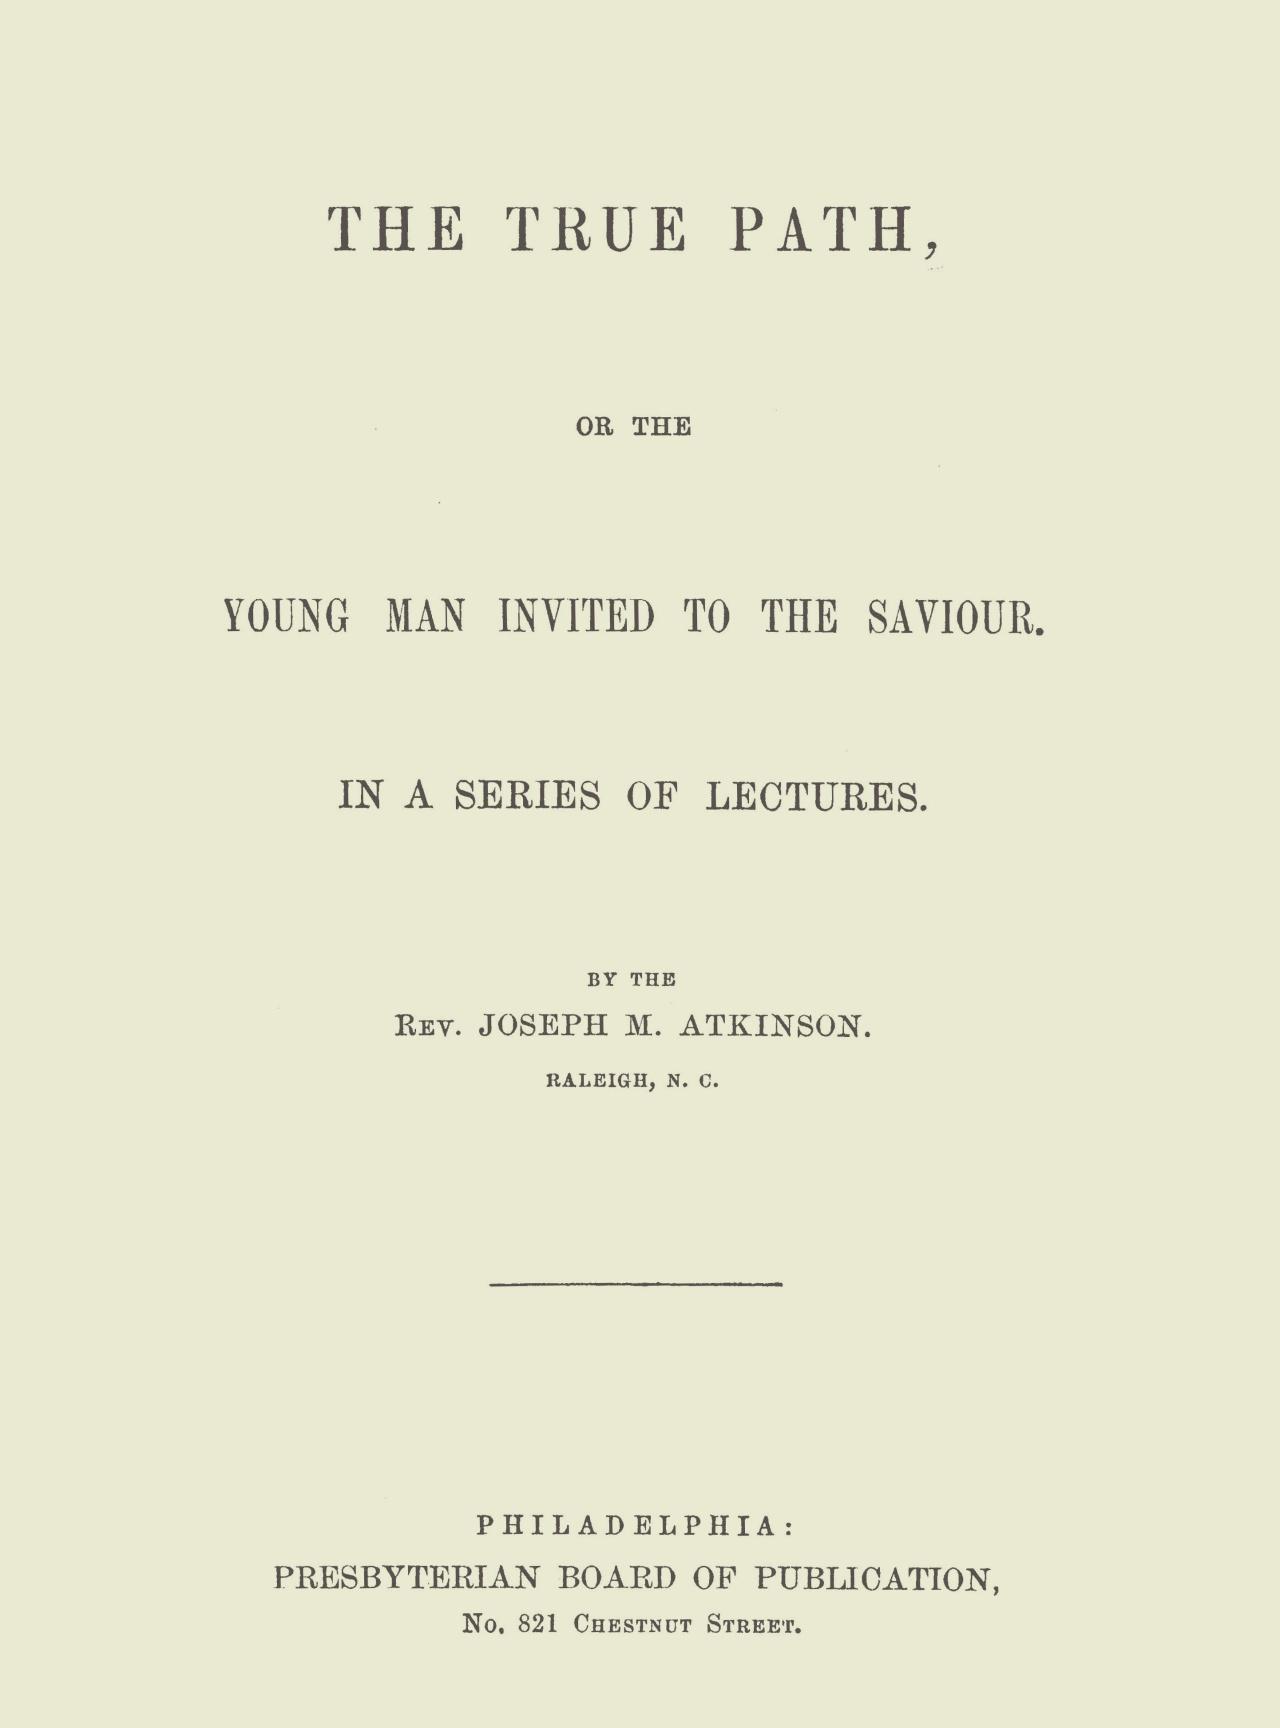 Atkinson, Joseph Mayo, The True Path Title Page.jpg